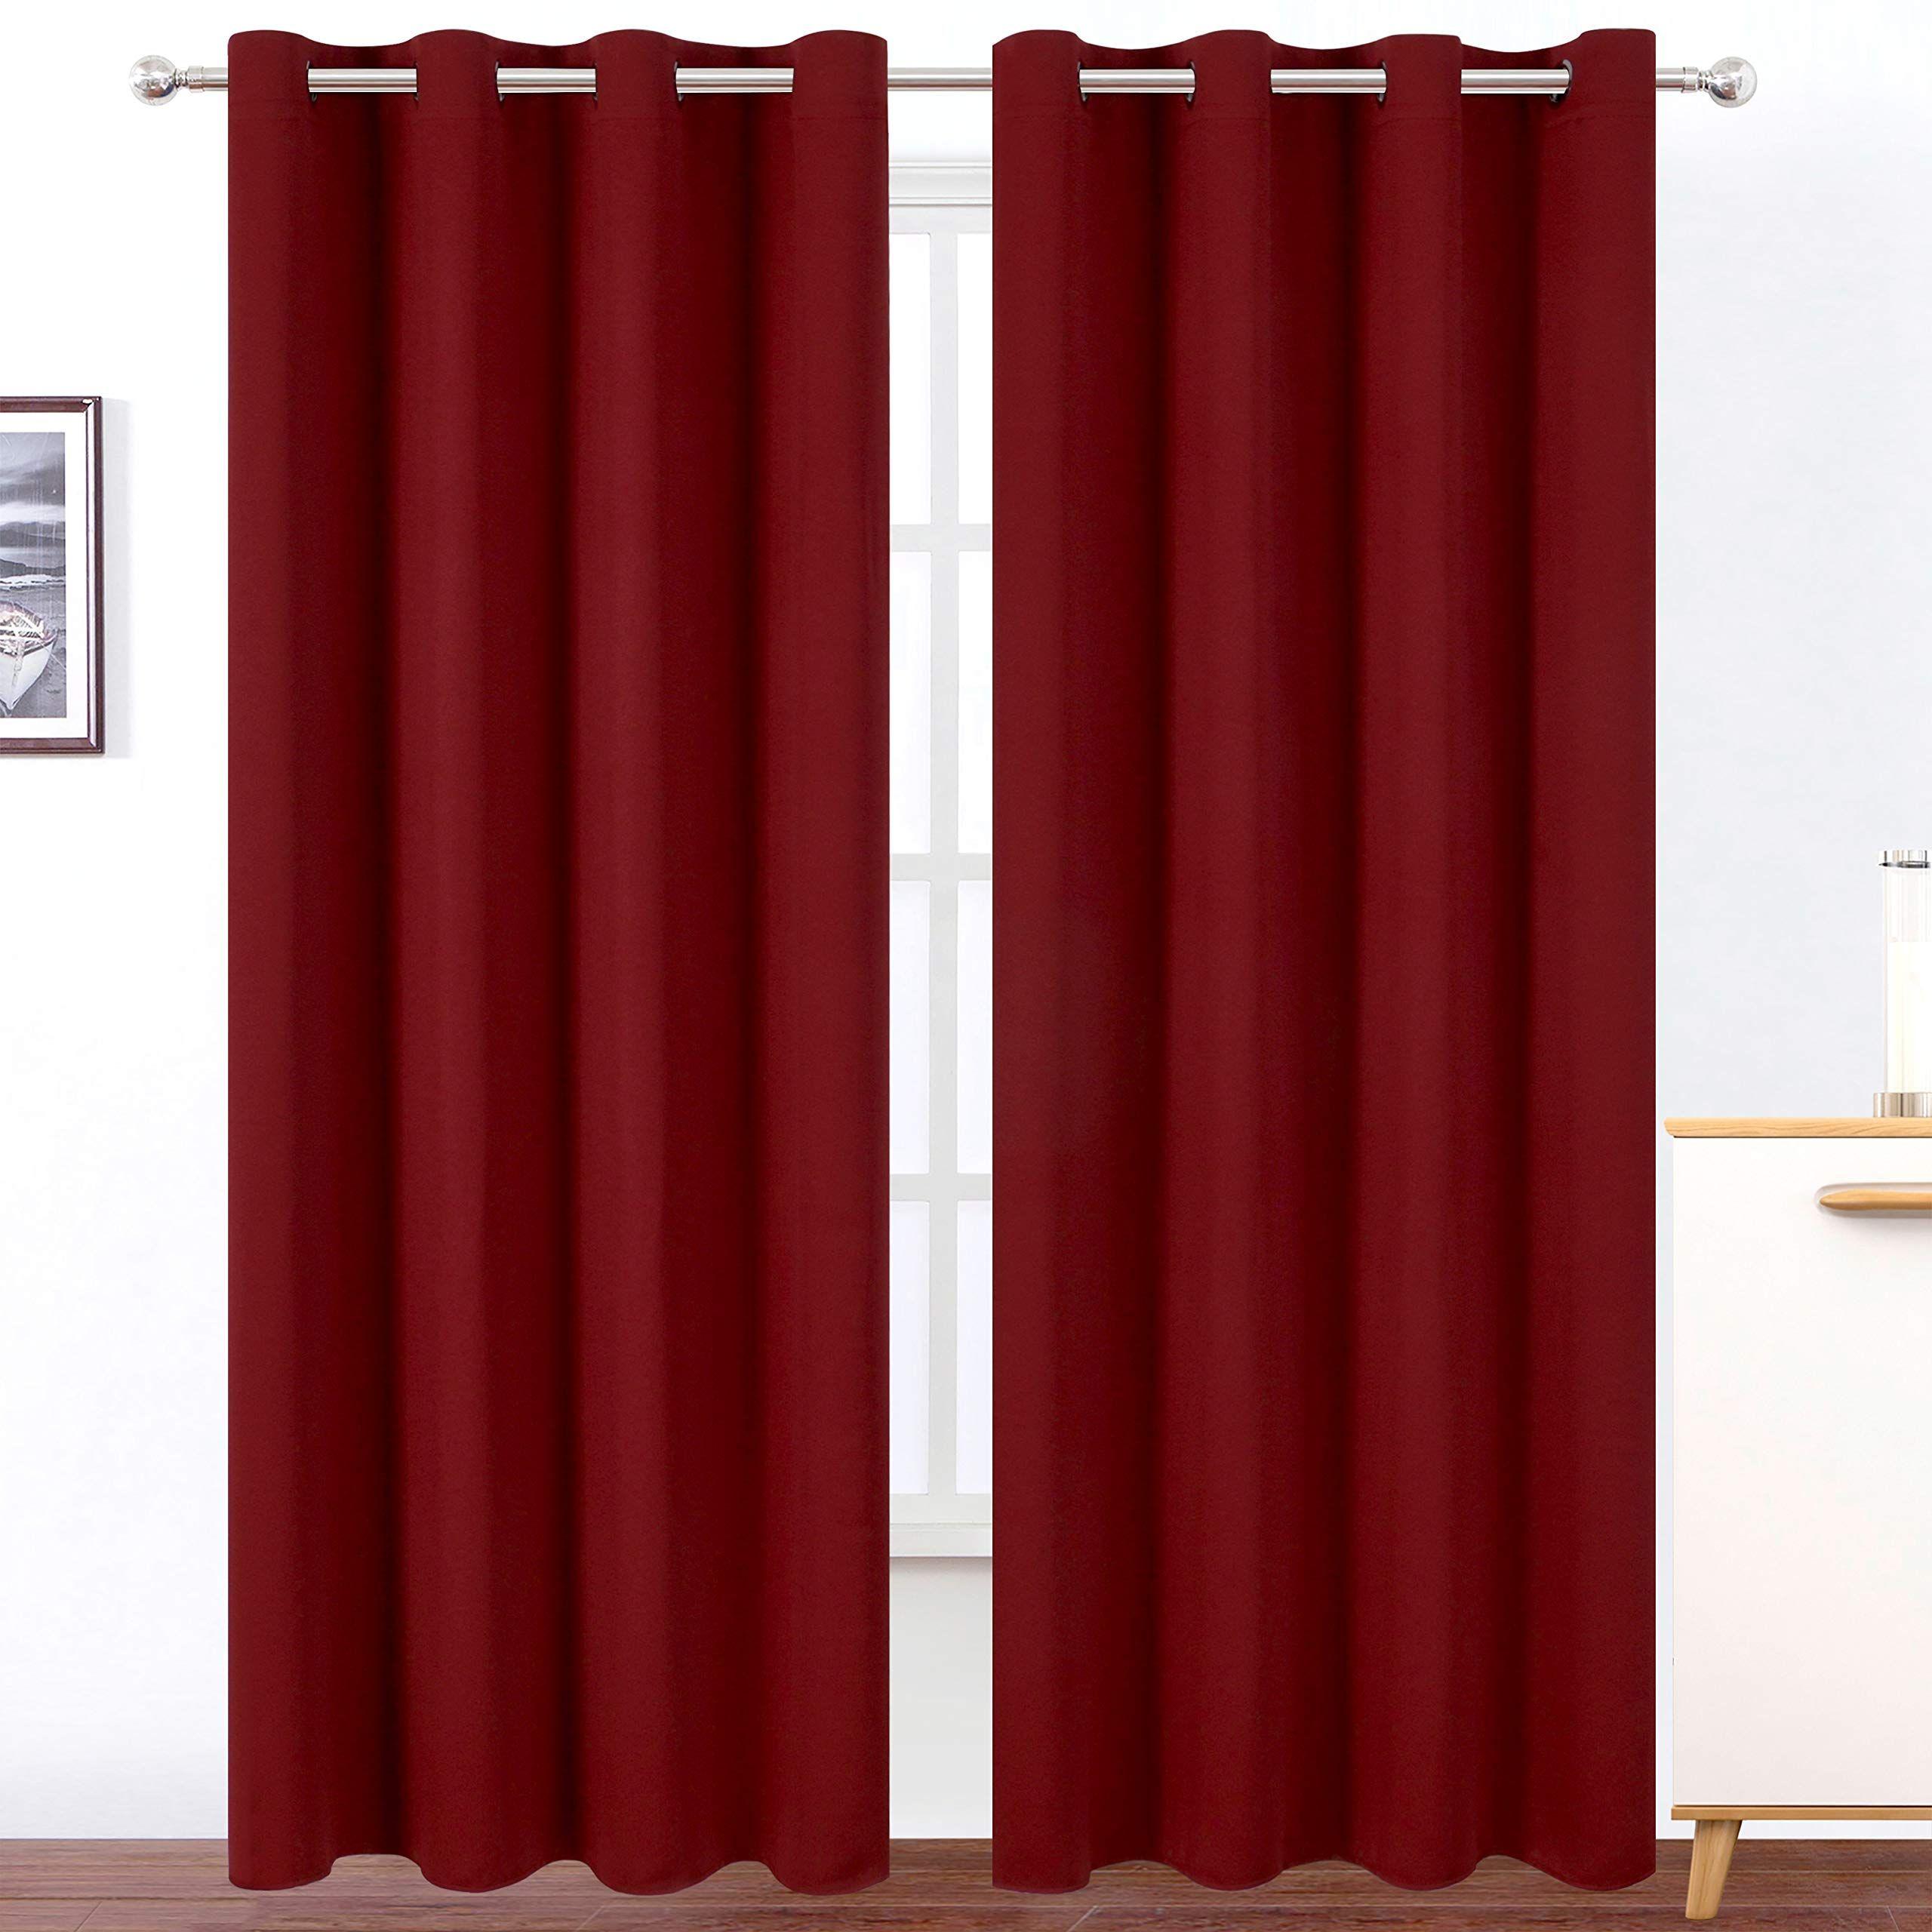 Lemomo Burgundy Red Bedroom Blackout Curtains 52 X 84 Inch Long Set Of 2 Panels Room Darkening Thermal Insulated Liv Curtains Red Curtains Bedroom Red Curtains